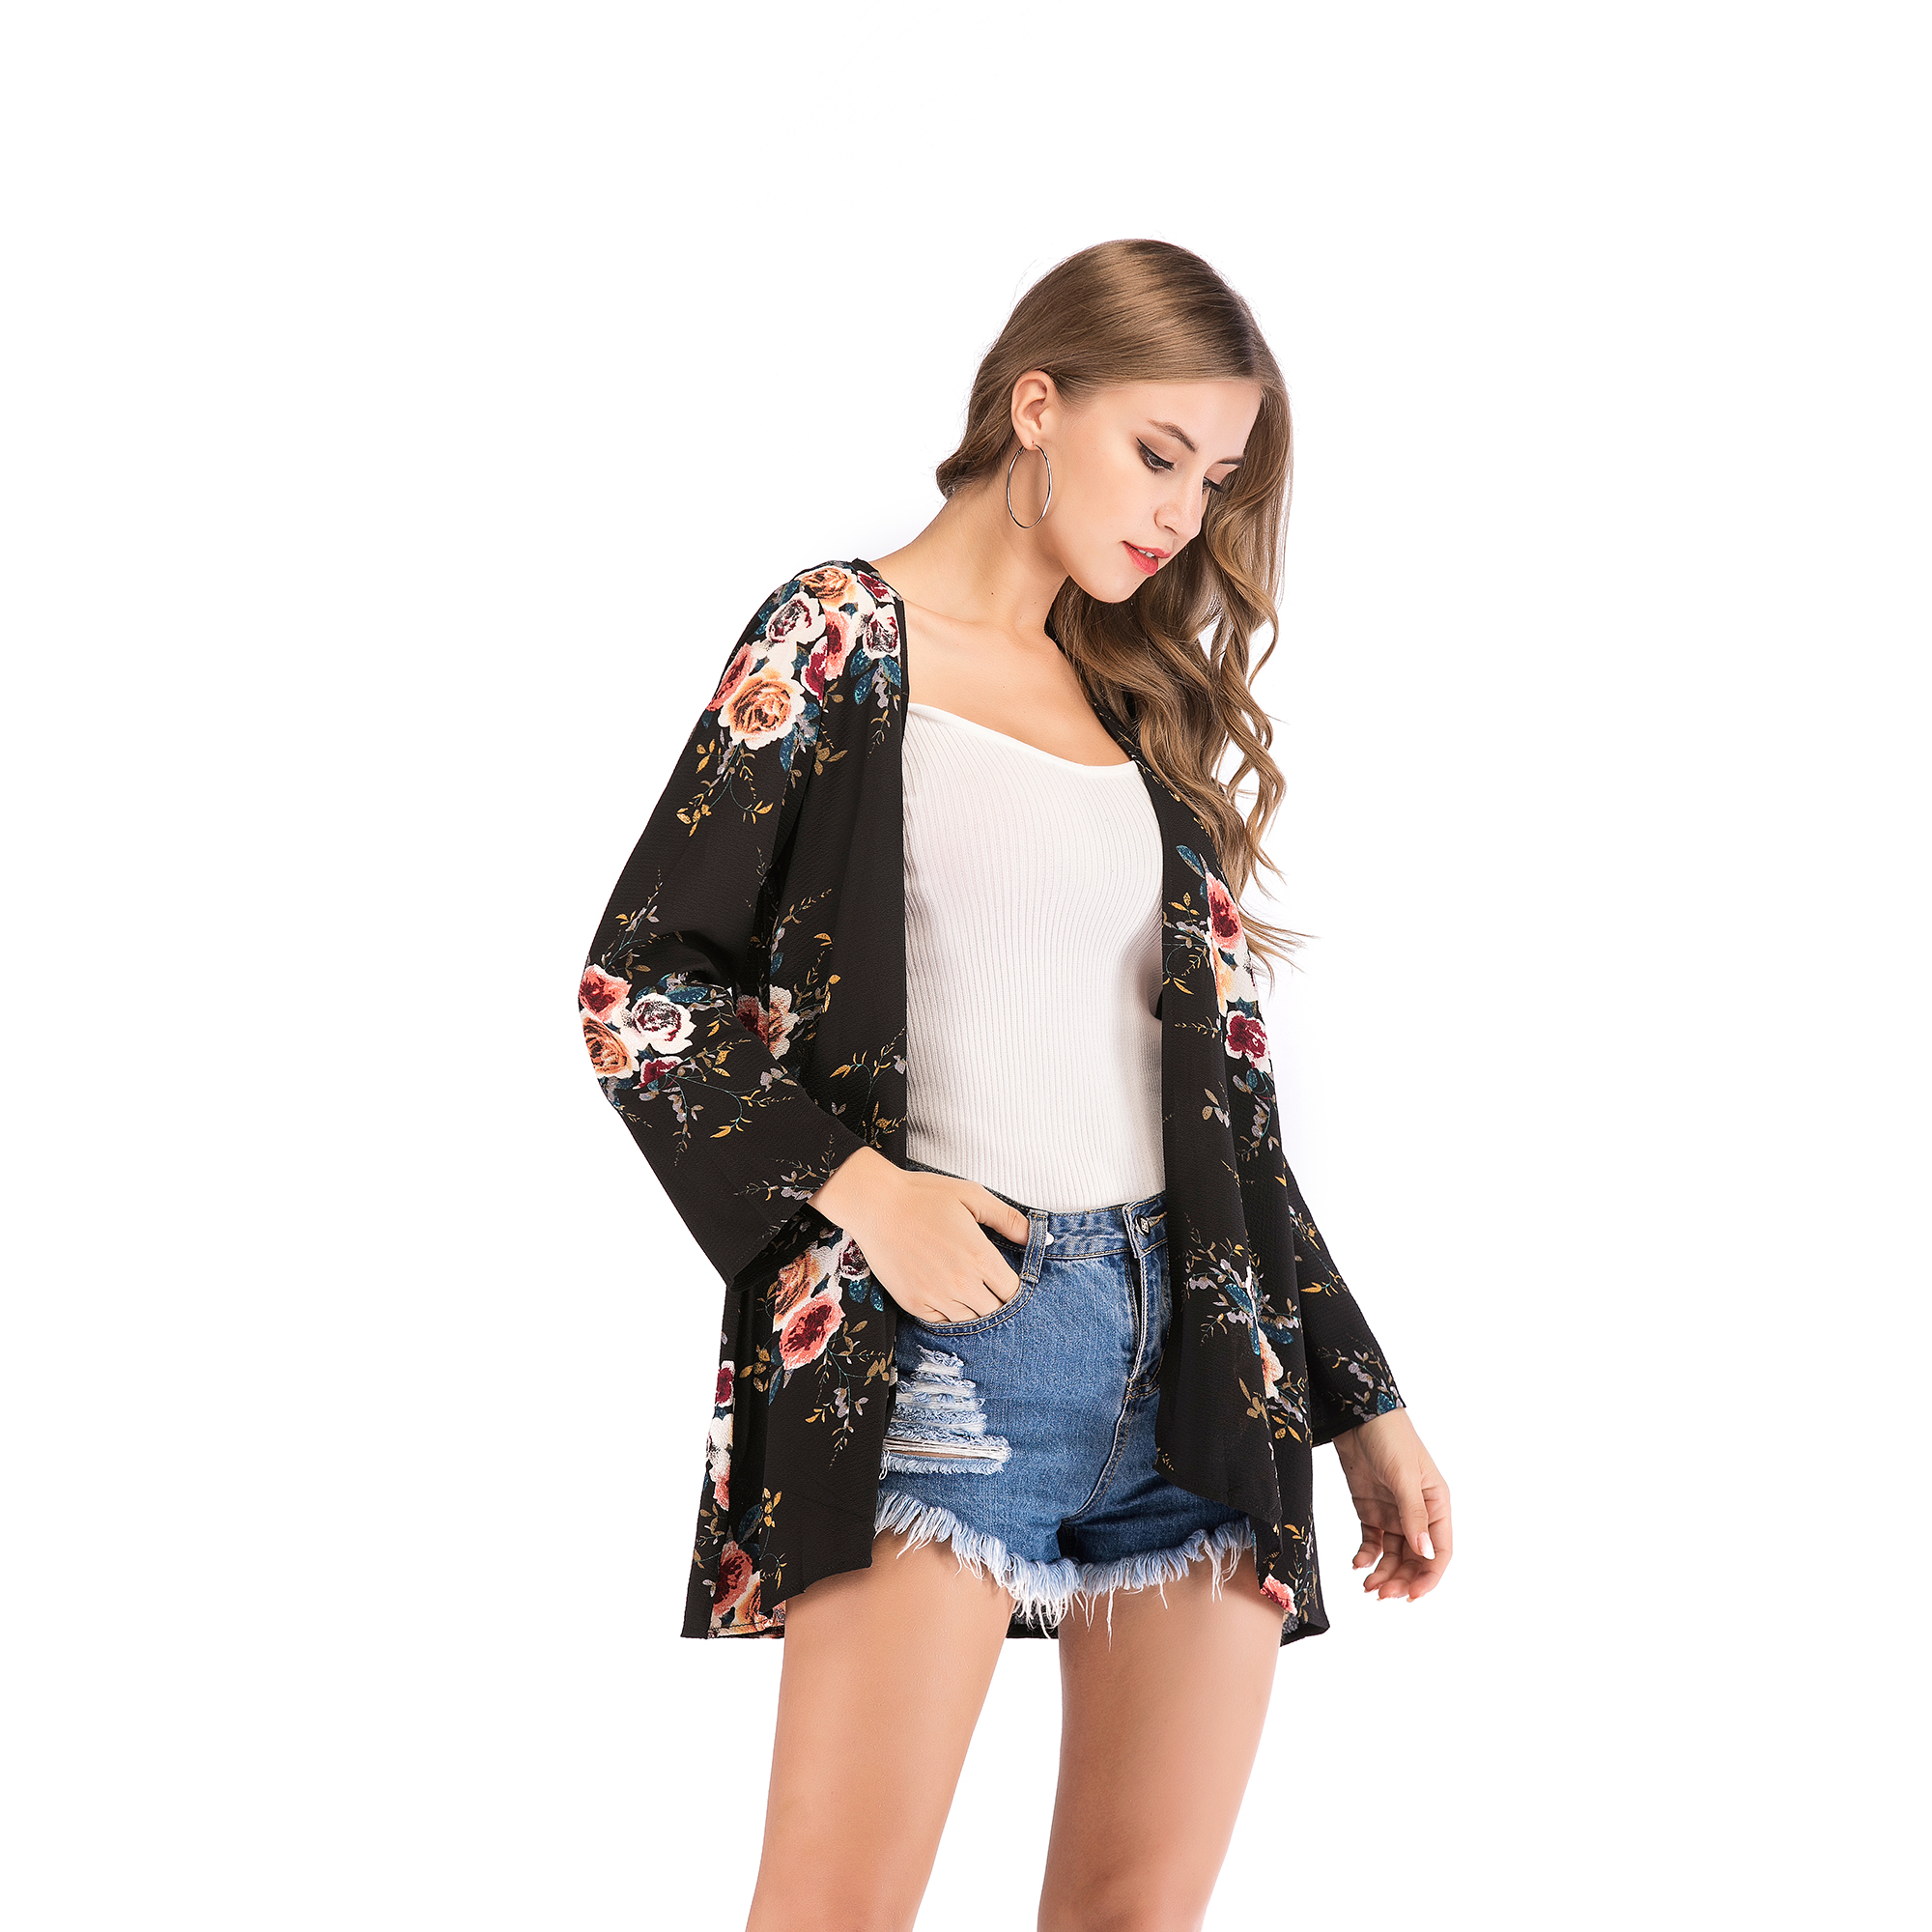 Fashion-Women-Loose-Blouse-Kimono-Cardigan-Tops-Summer-Bikini-Cover-Up-Wrap-Coat thumbnail 17